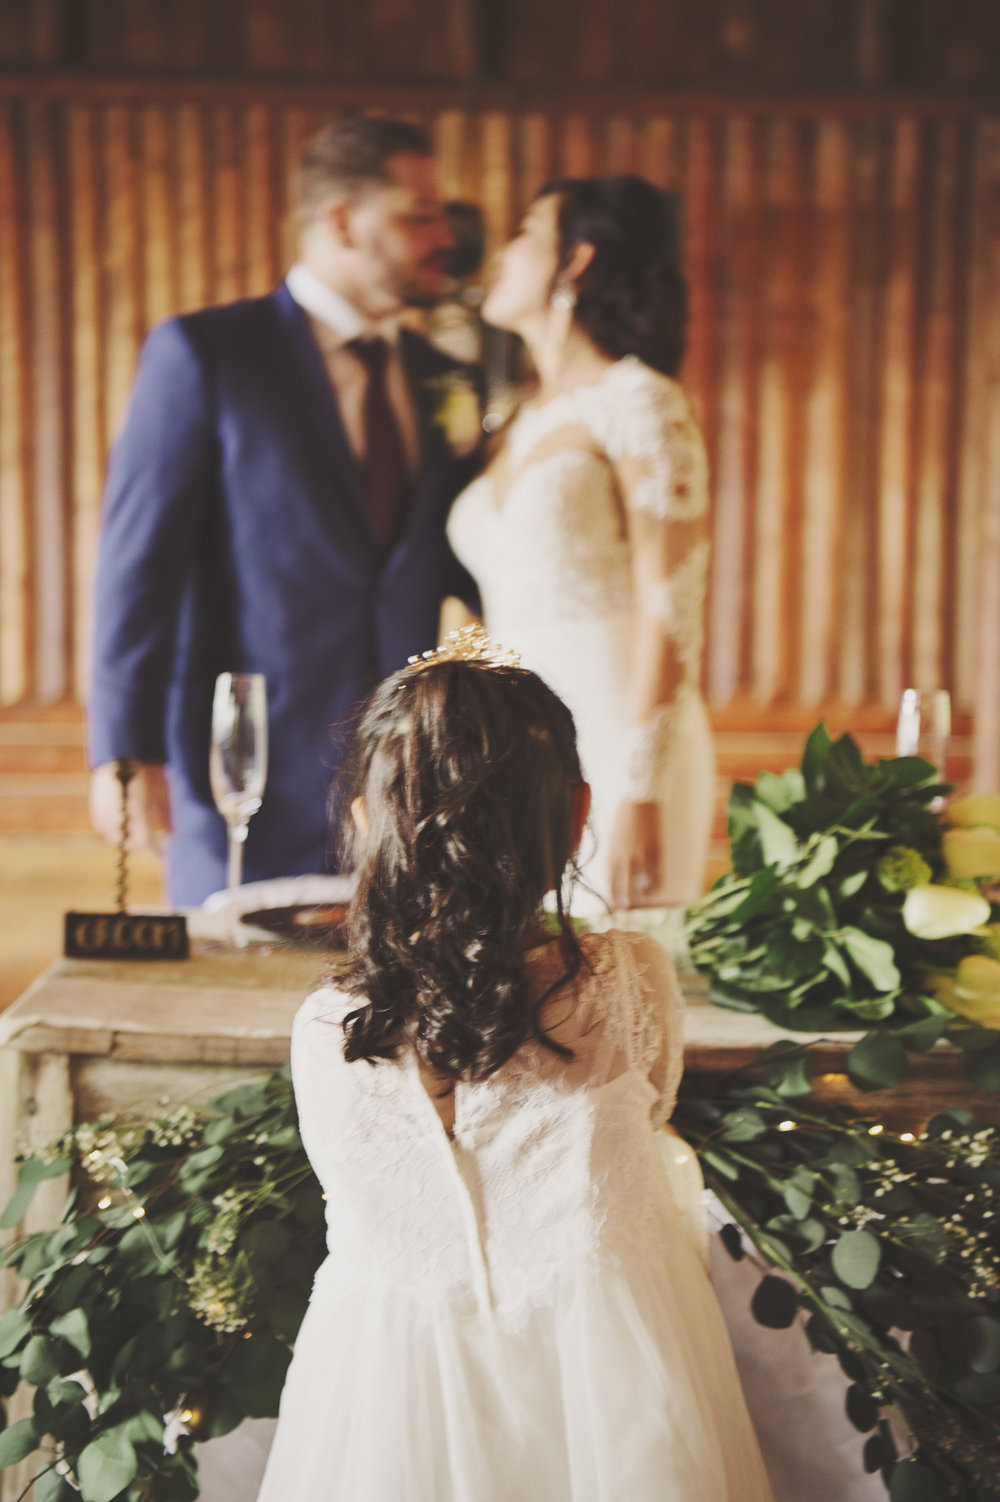 Woodsy Wedding_Kitsap Memorial State Park Wedding_Kelsey Lane Photography_kissing at reception